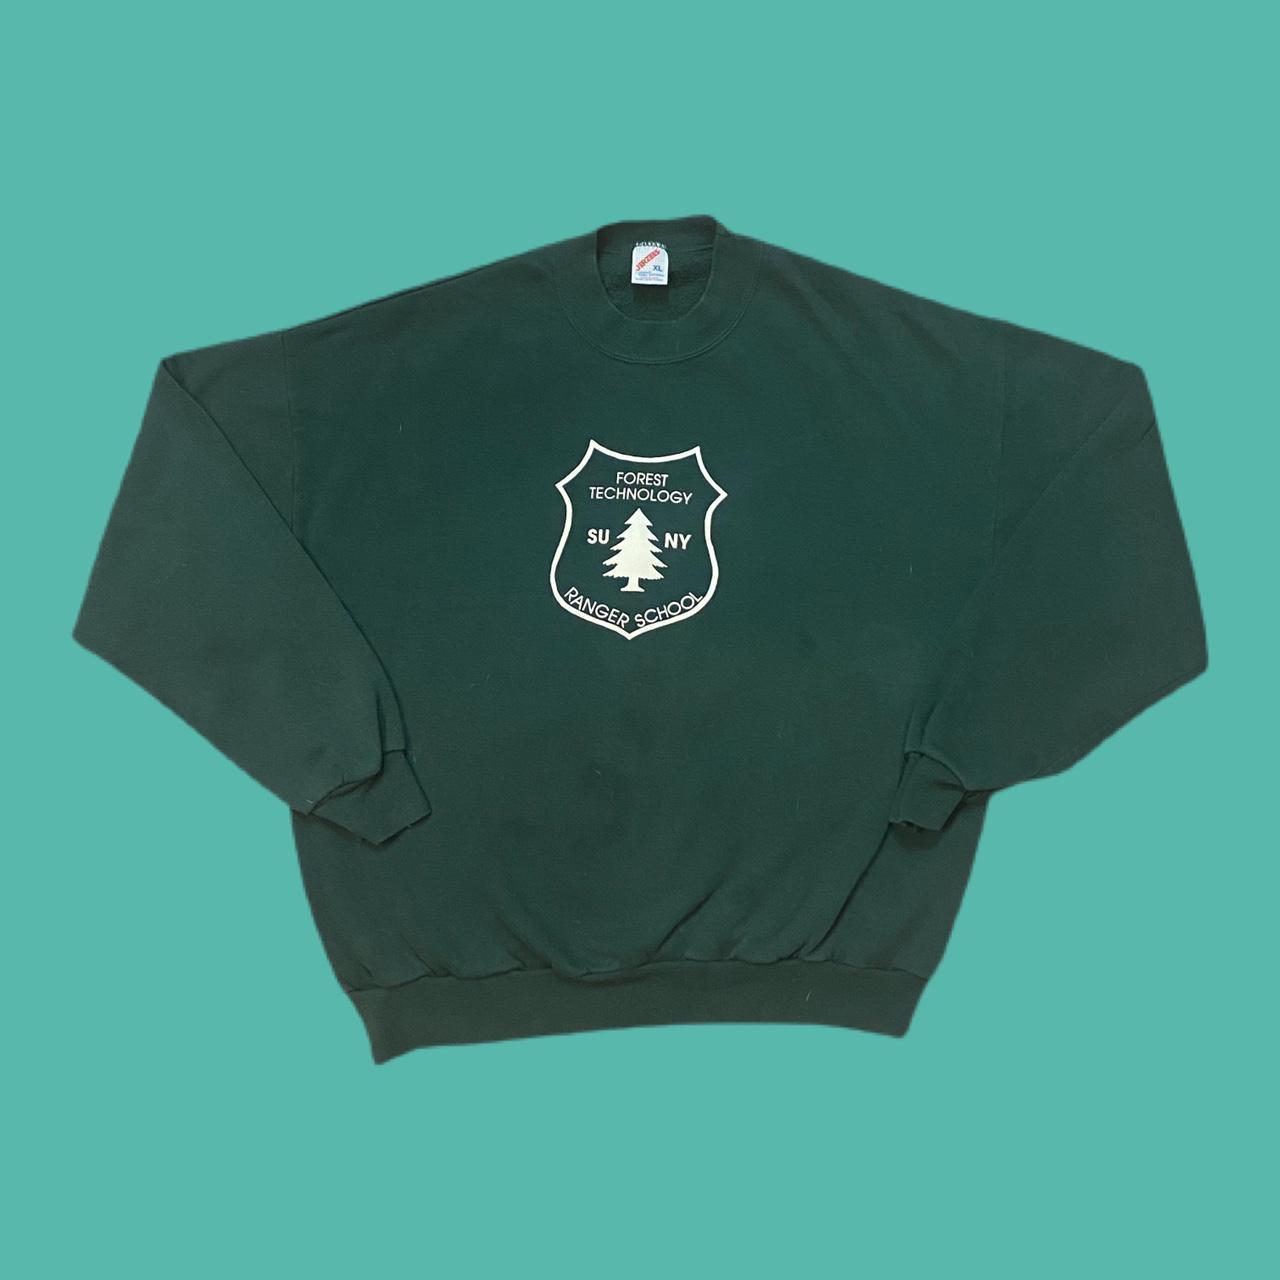 Product Image 1 - Vintage SUNY Ranger school sweatshirt!  Measurements: p2p